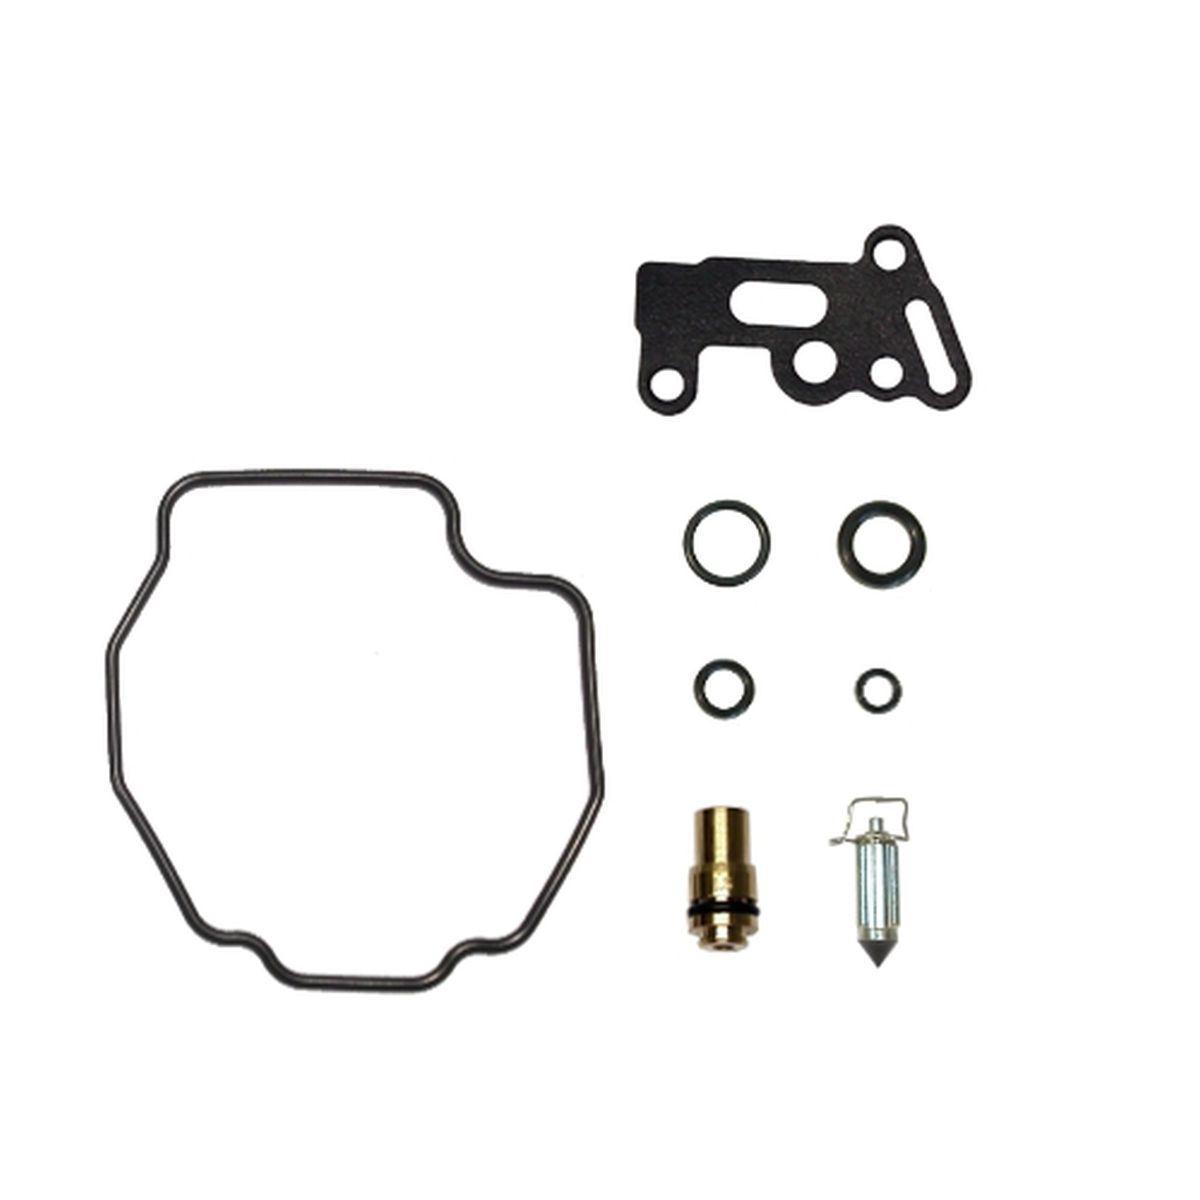 AW Motorcycle Parts. Carburettor Repair Kit Yamaha XV535